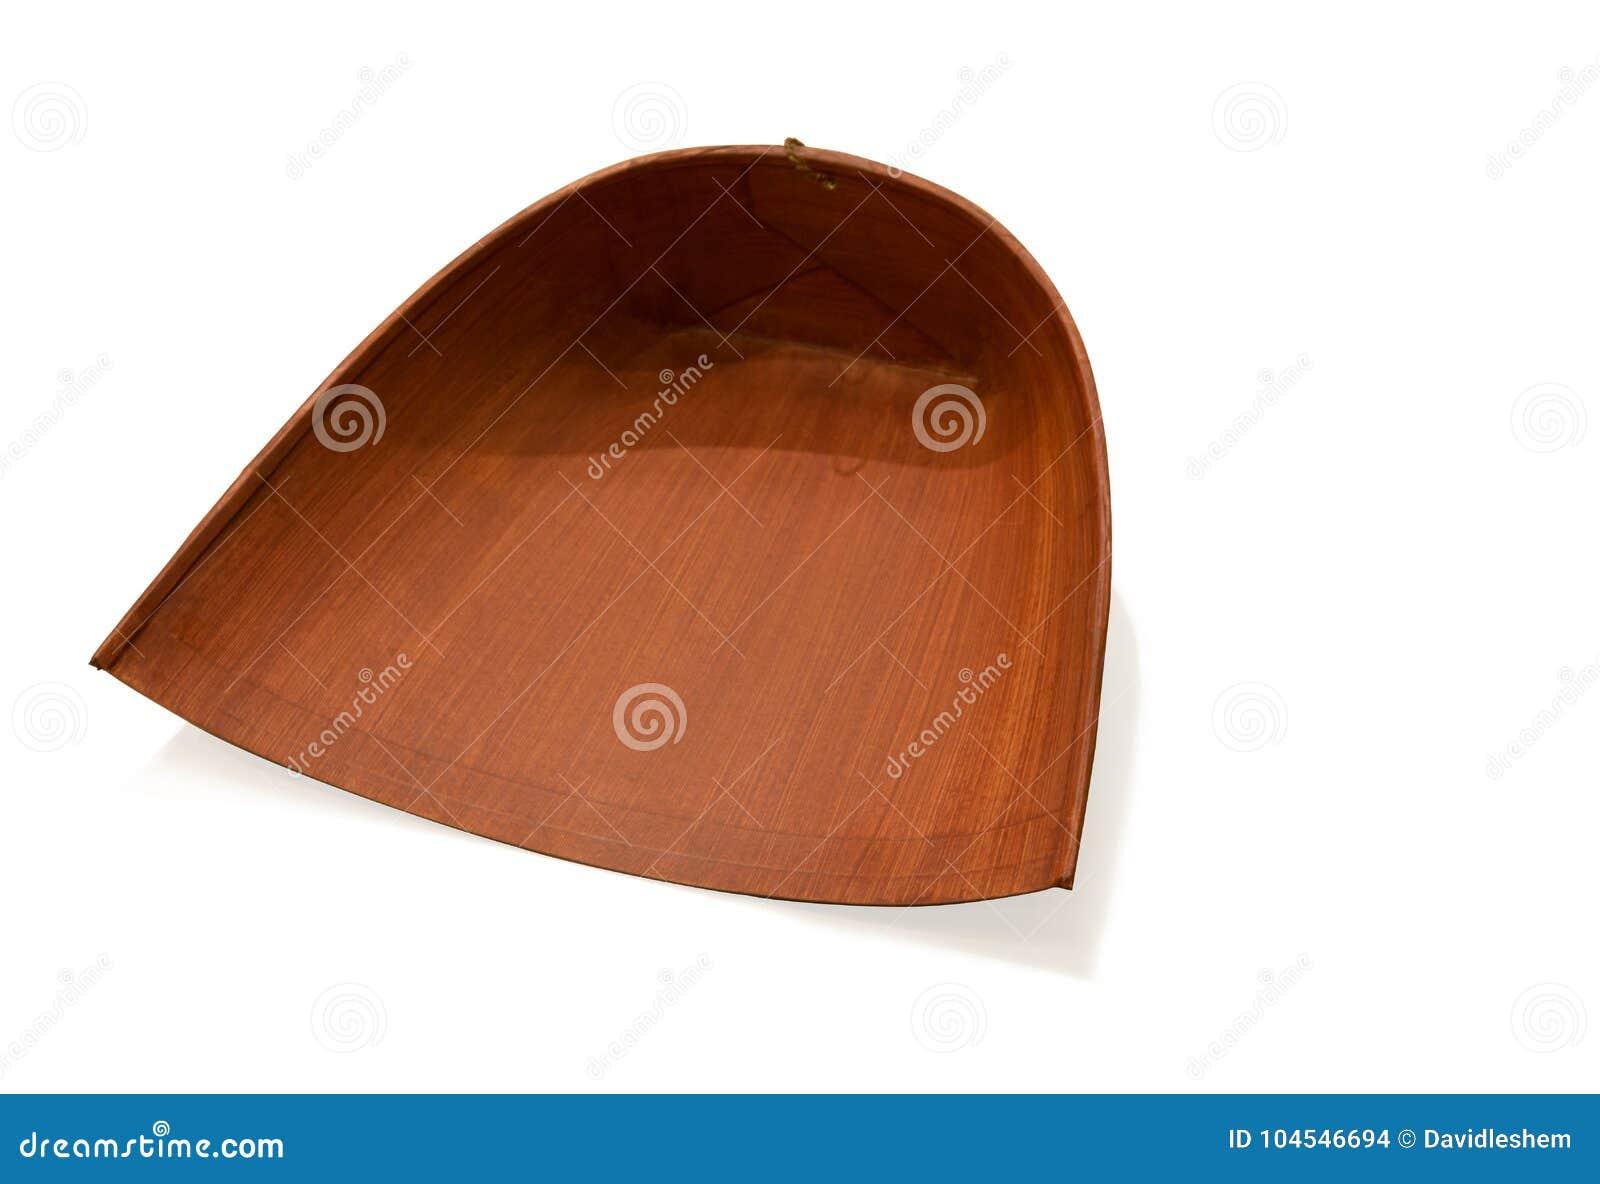 Asian bamboo dustpan stock photo  Image of dust, broom - 104546694